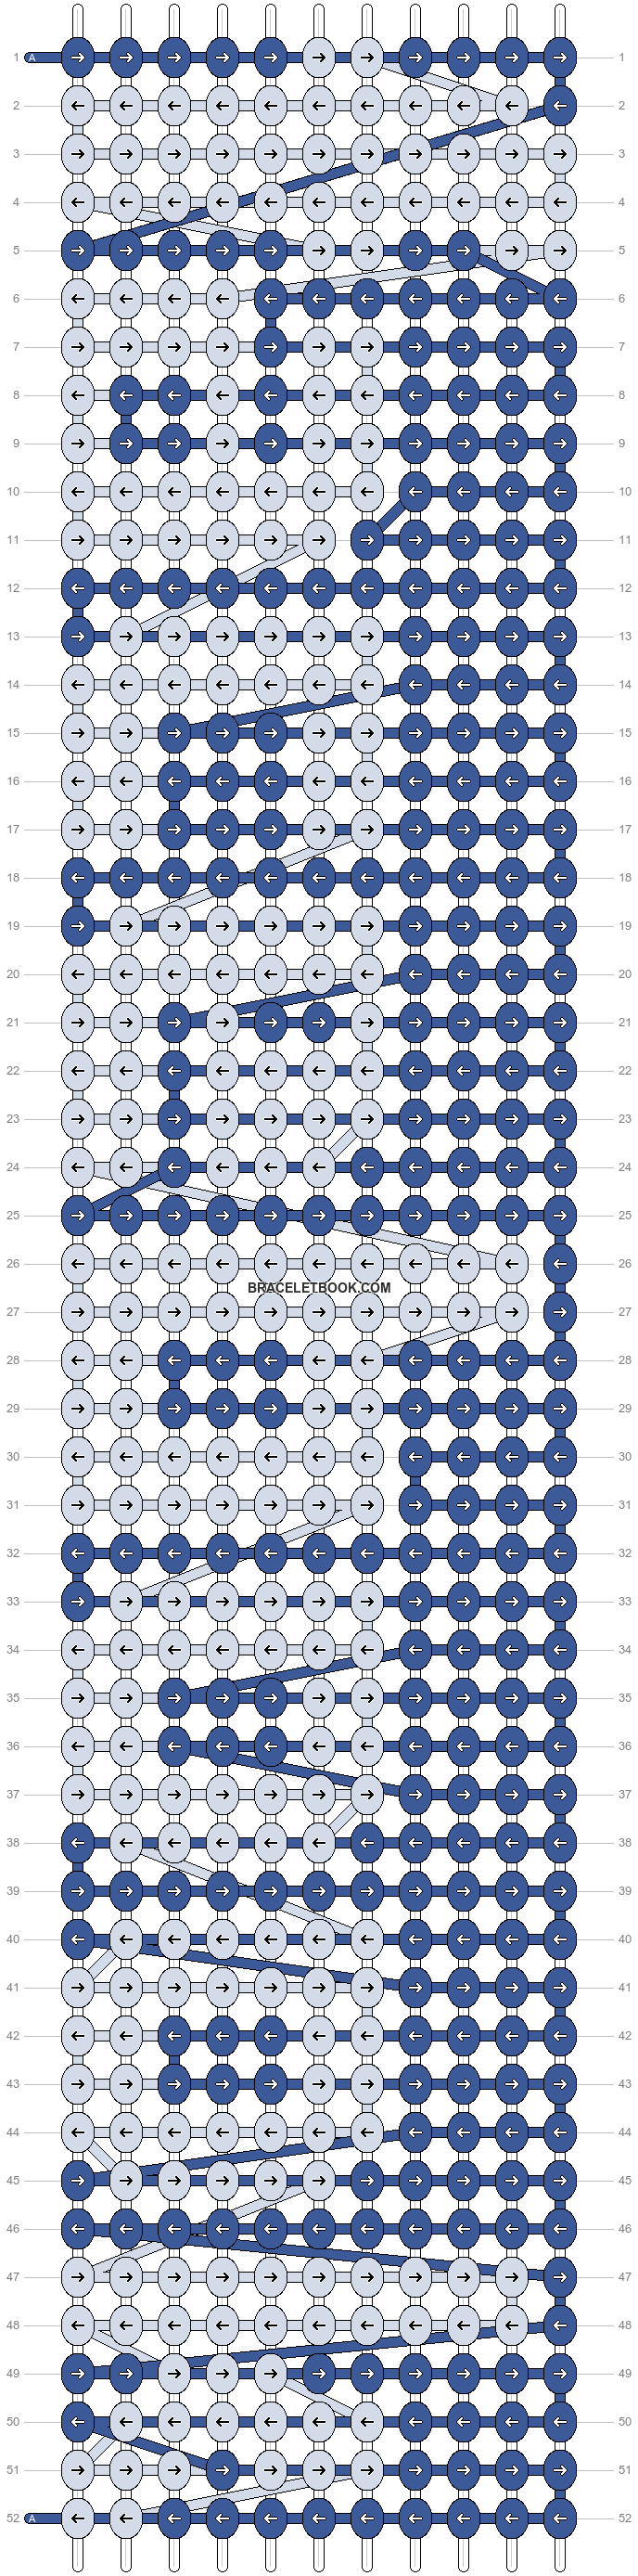 Alpha pattern #7810 pattern